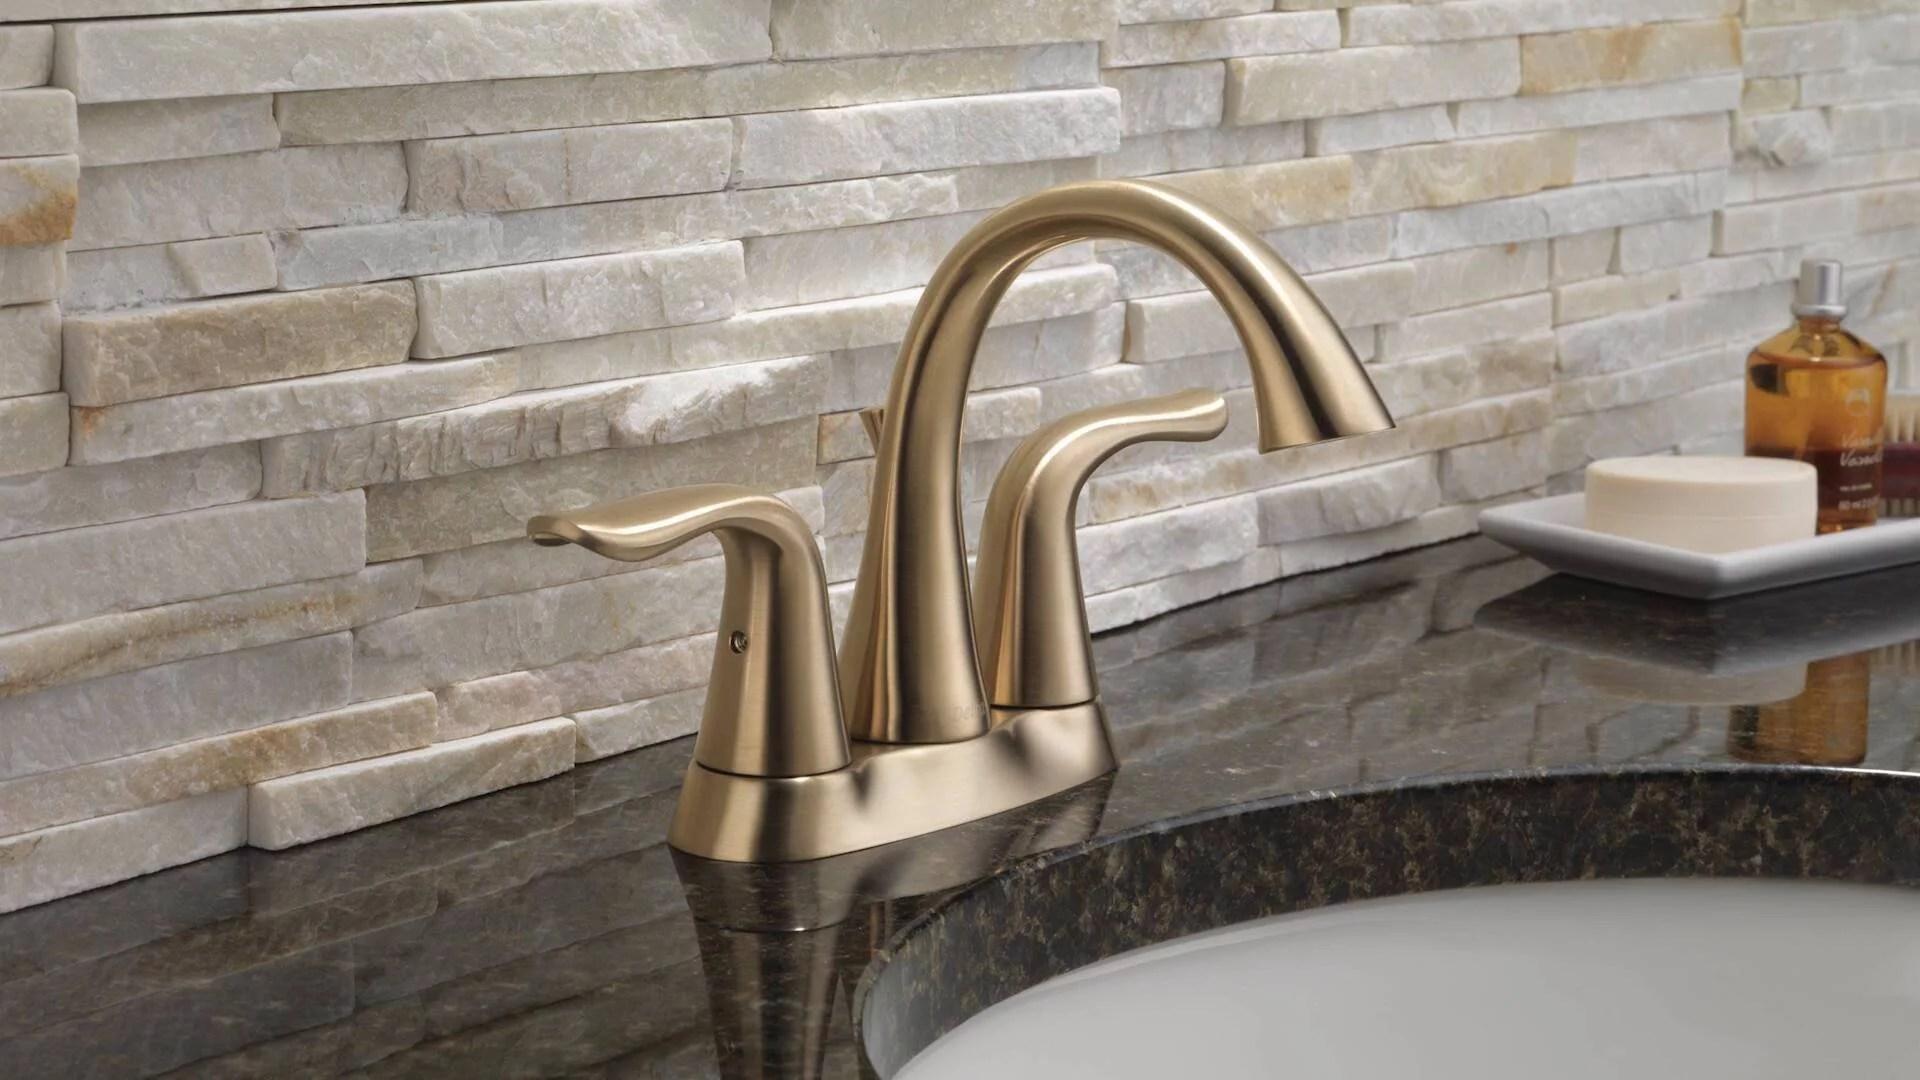 medprd 1823 faq bathroom faucet youtube